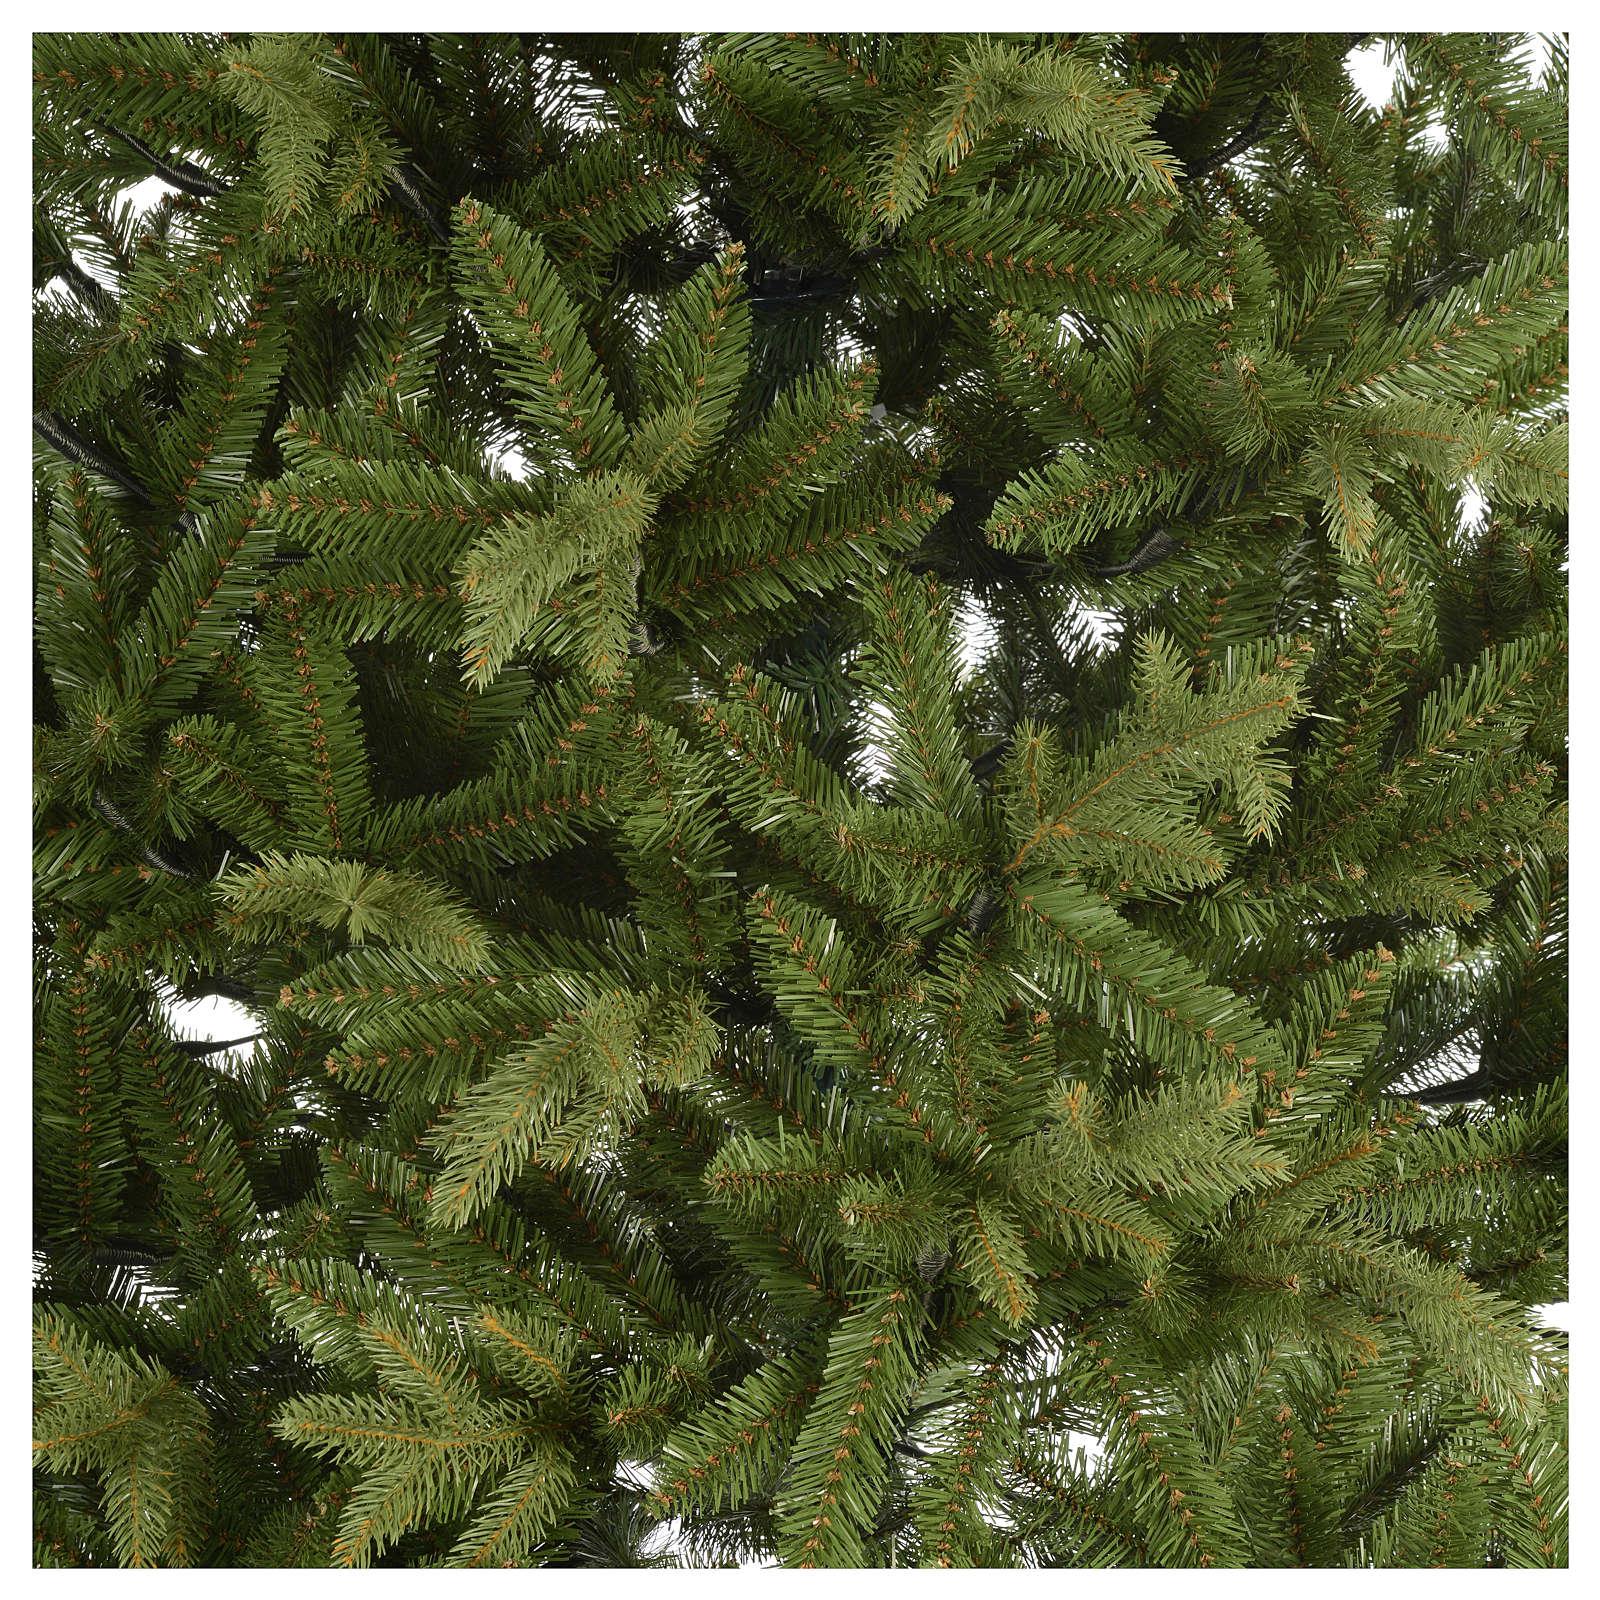 Choinka sztuczna 210 cm zielona Poly Bloomfield Fir 3